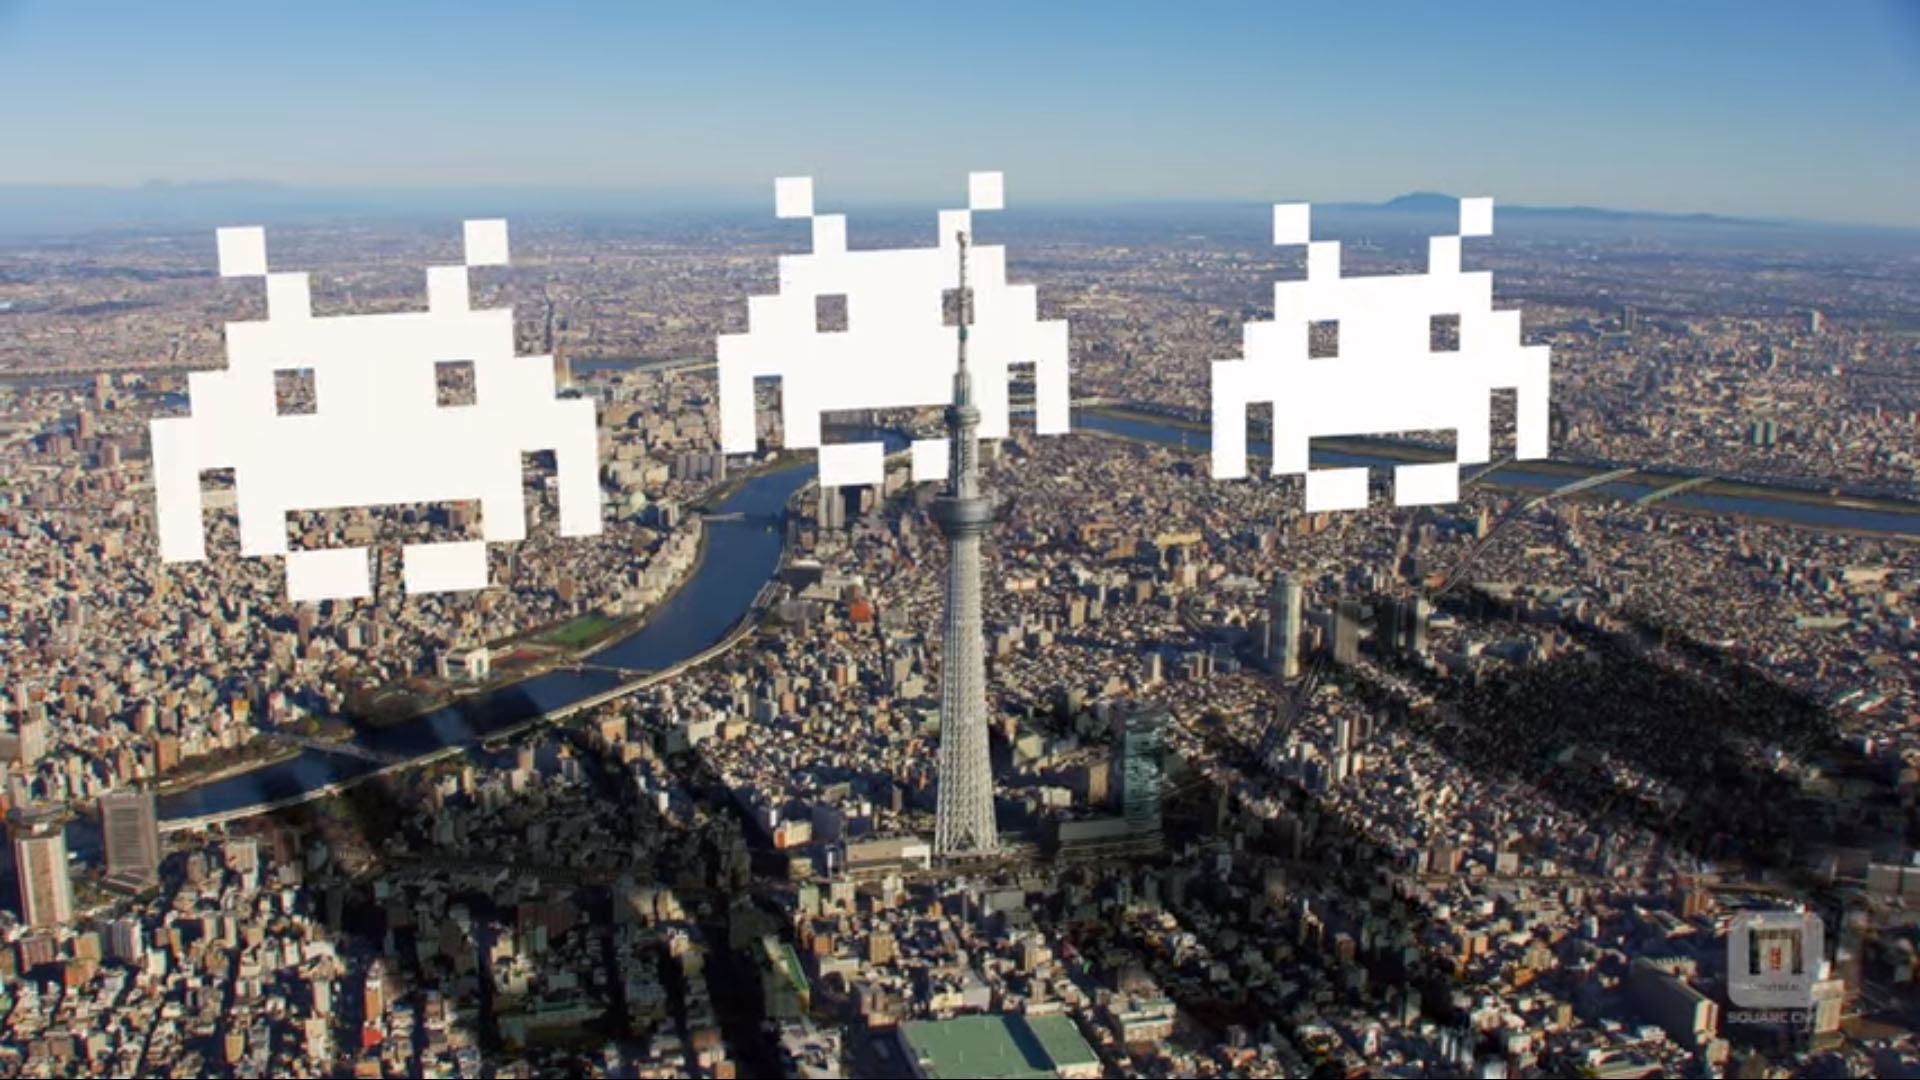 Space Invaders AR Tokyo Skytree